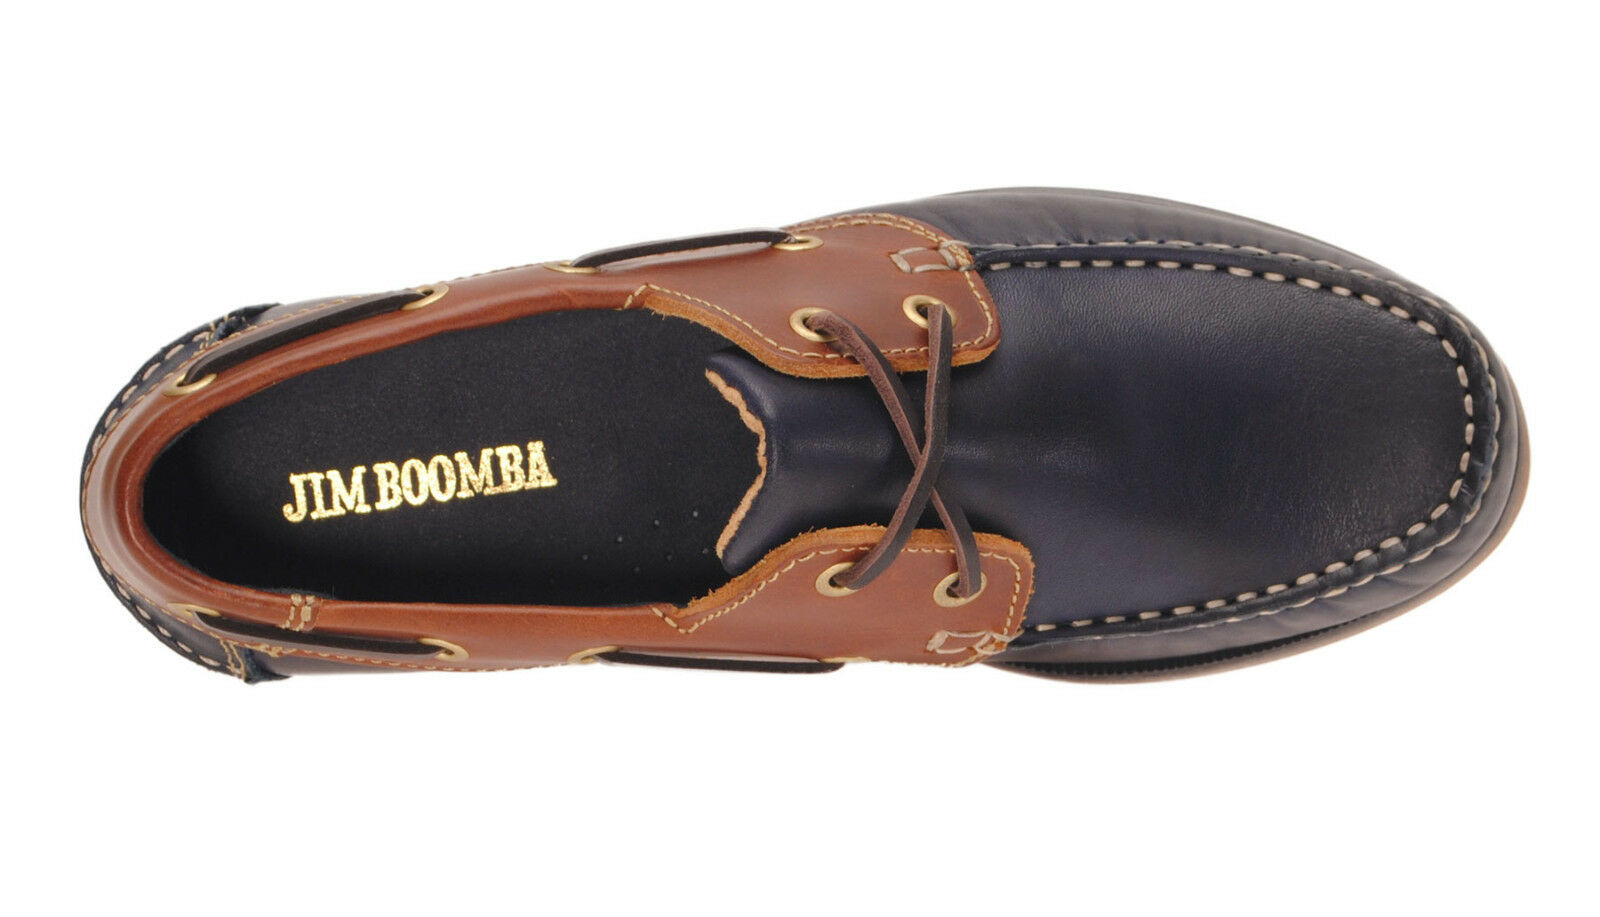 Jim Boomba Premium Leder Boat Boat Boat Schuhes,Deck Schuhe -Mahogany-Cedar Braun-Navy Blau a03e8c